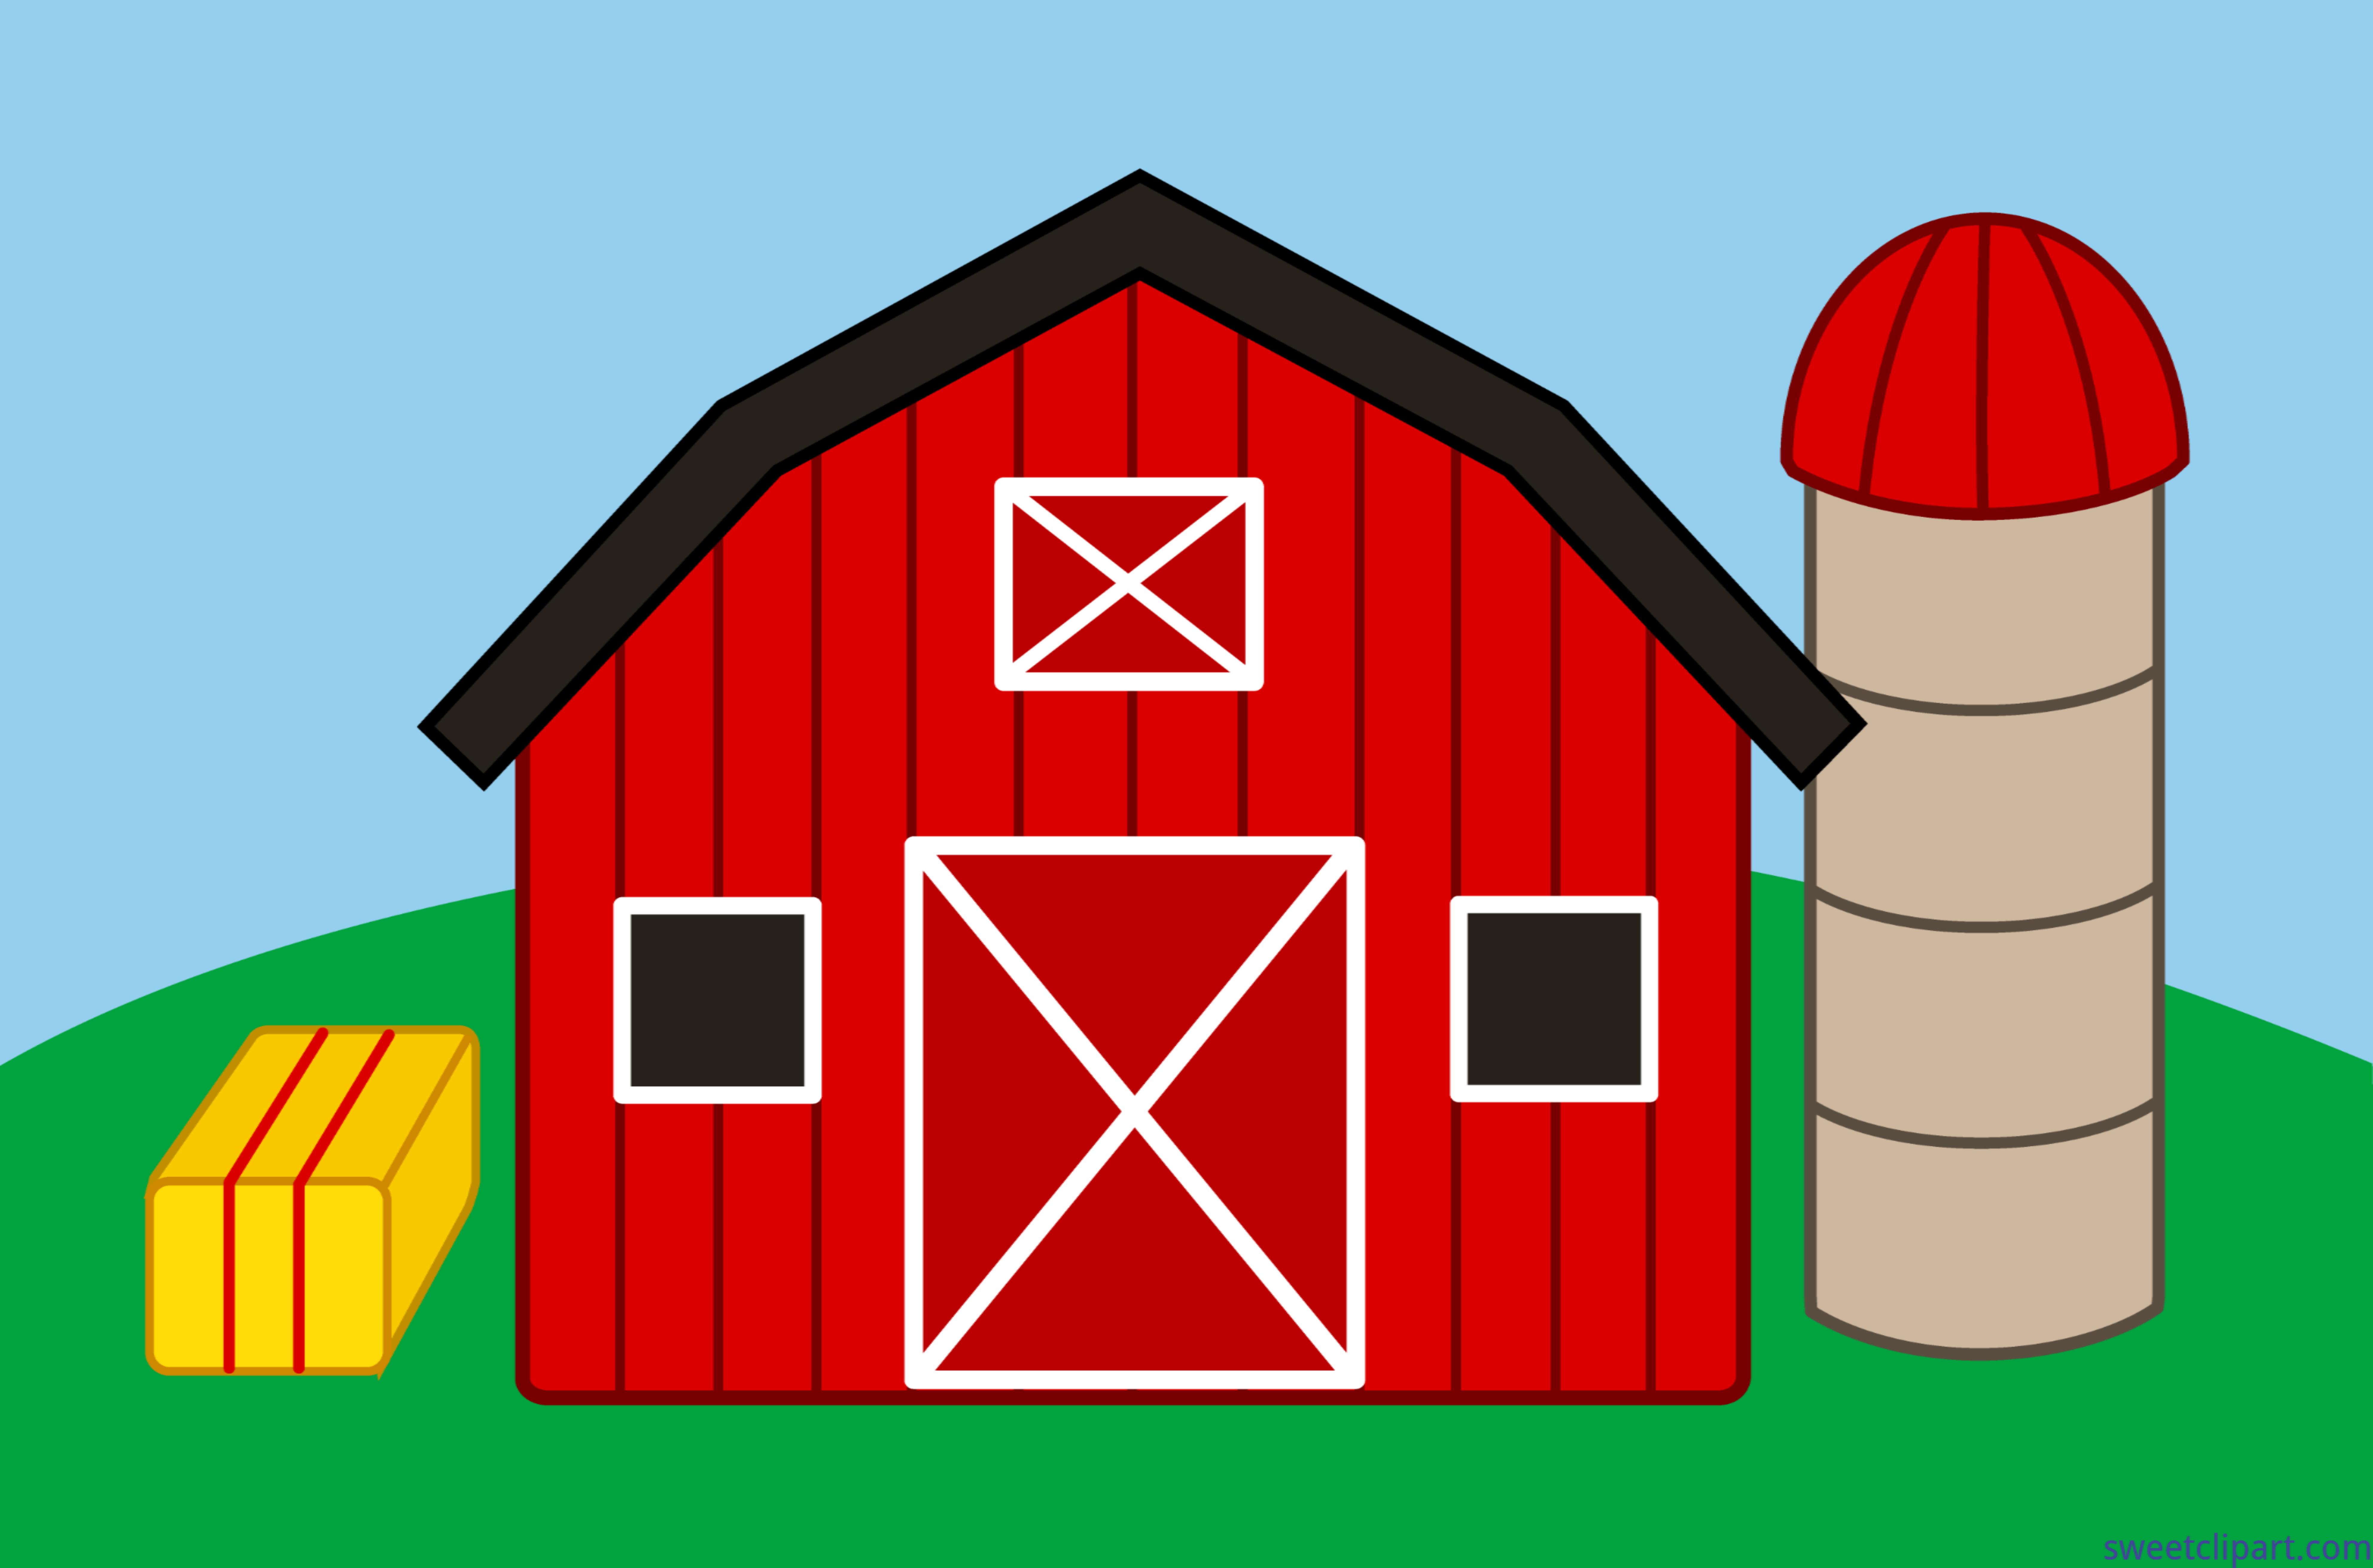 Farm scene clipart jpg royalty free stock Farm Scene Clip Art - Sweet Clip Art jpg royalty free stock